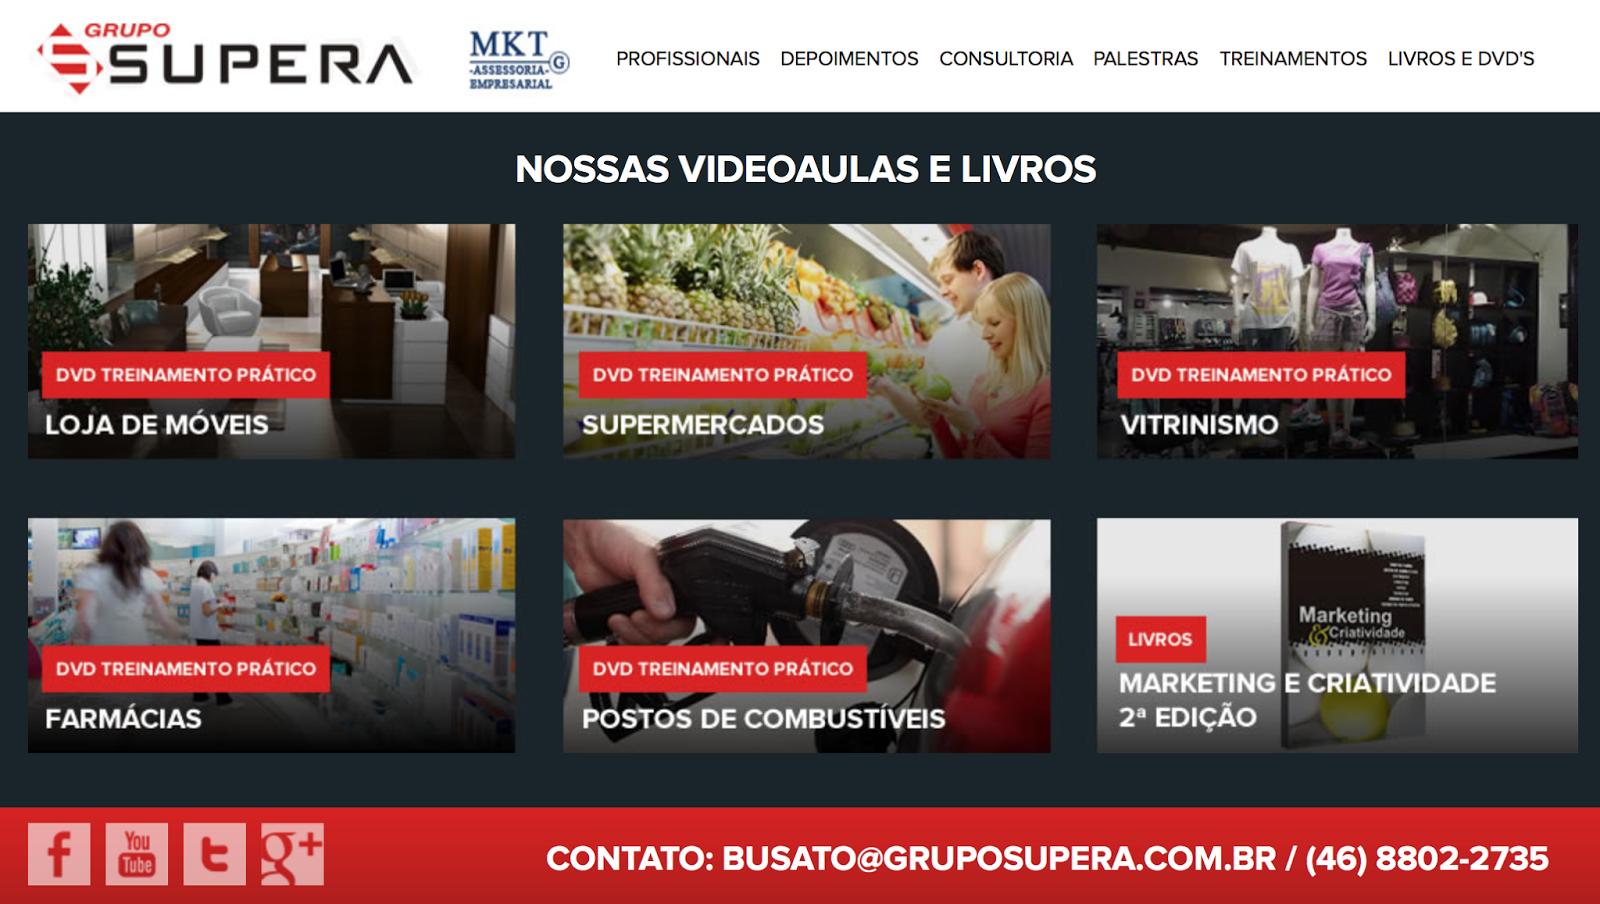 grupo supera, lorenzo busato, palestrante vendas, treinamento de frentista, consultoria para postos, consultoria para supermercados